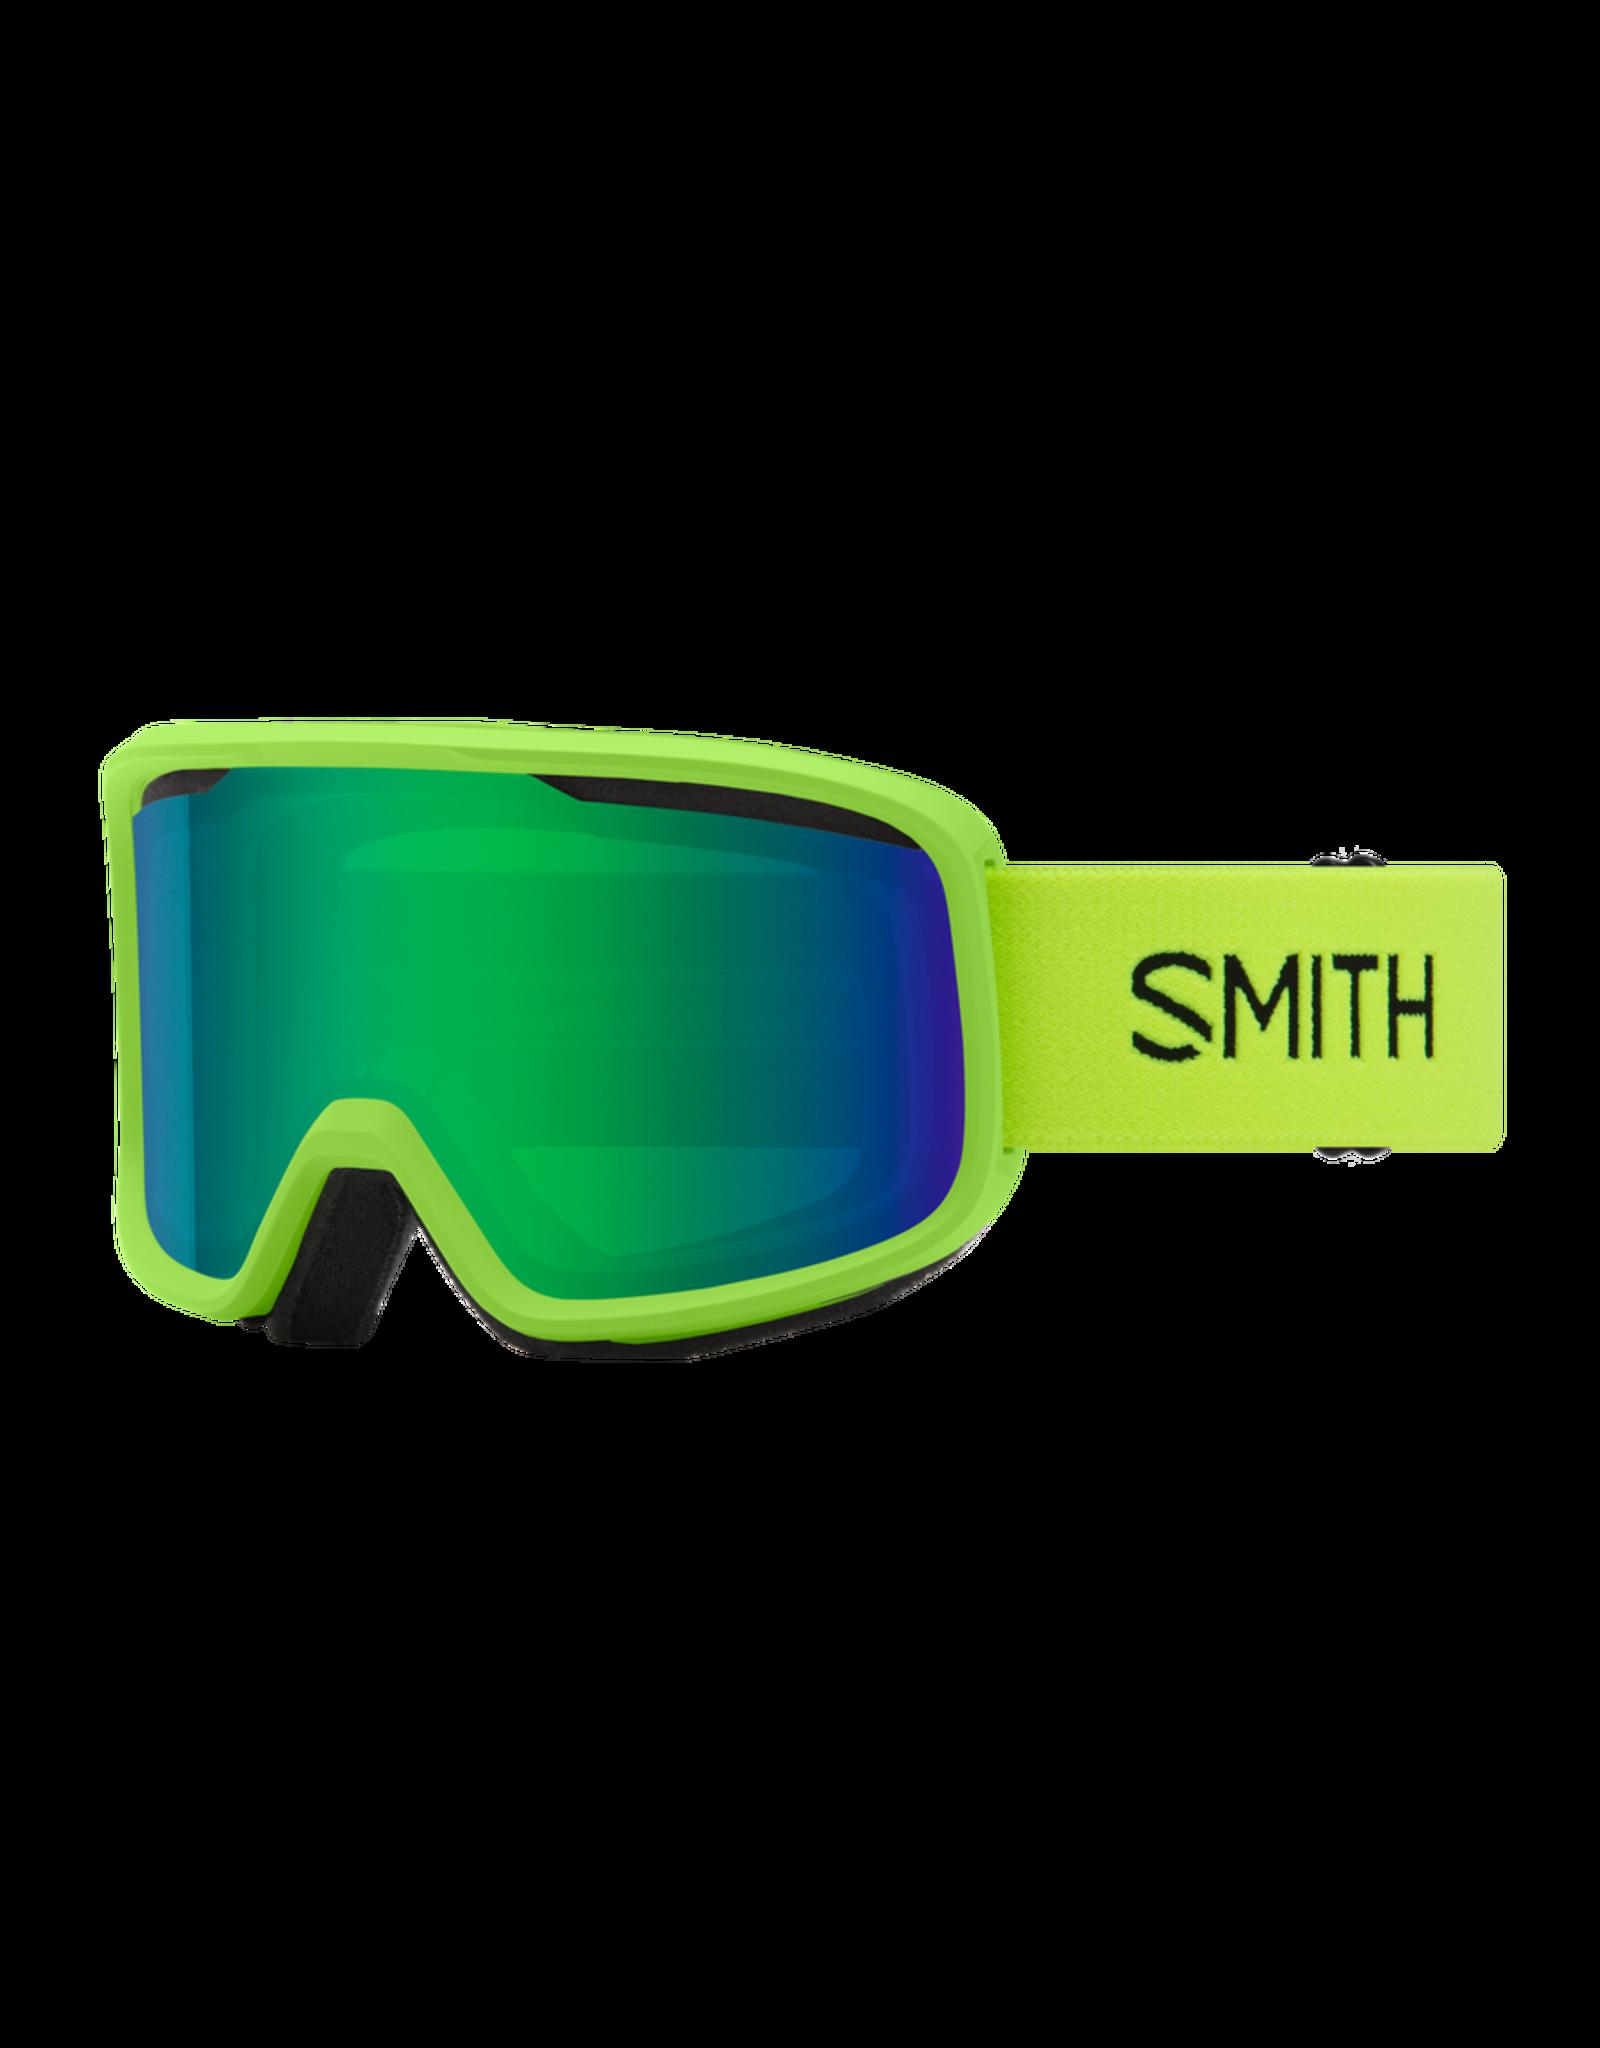 Smith Smith  Frontier Goggles